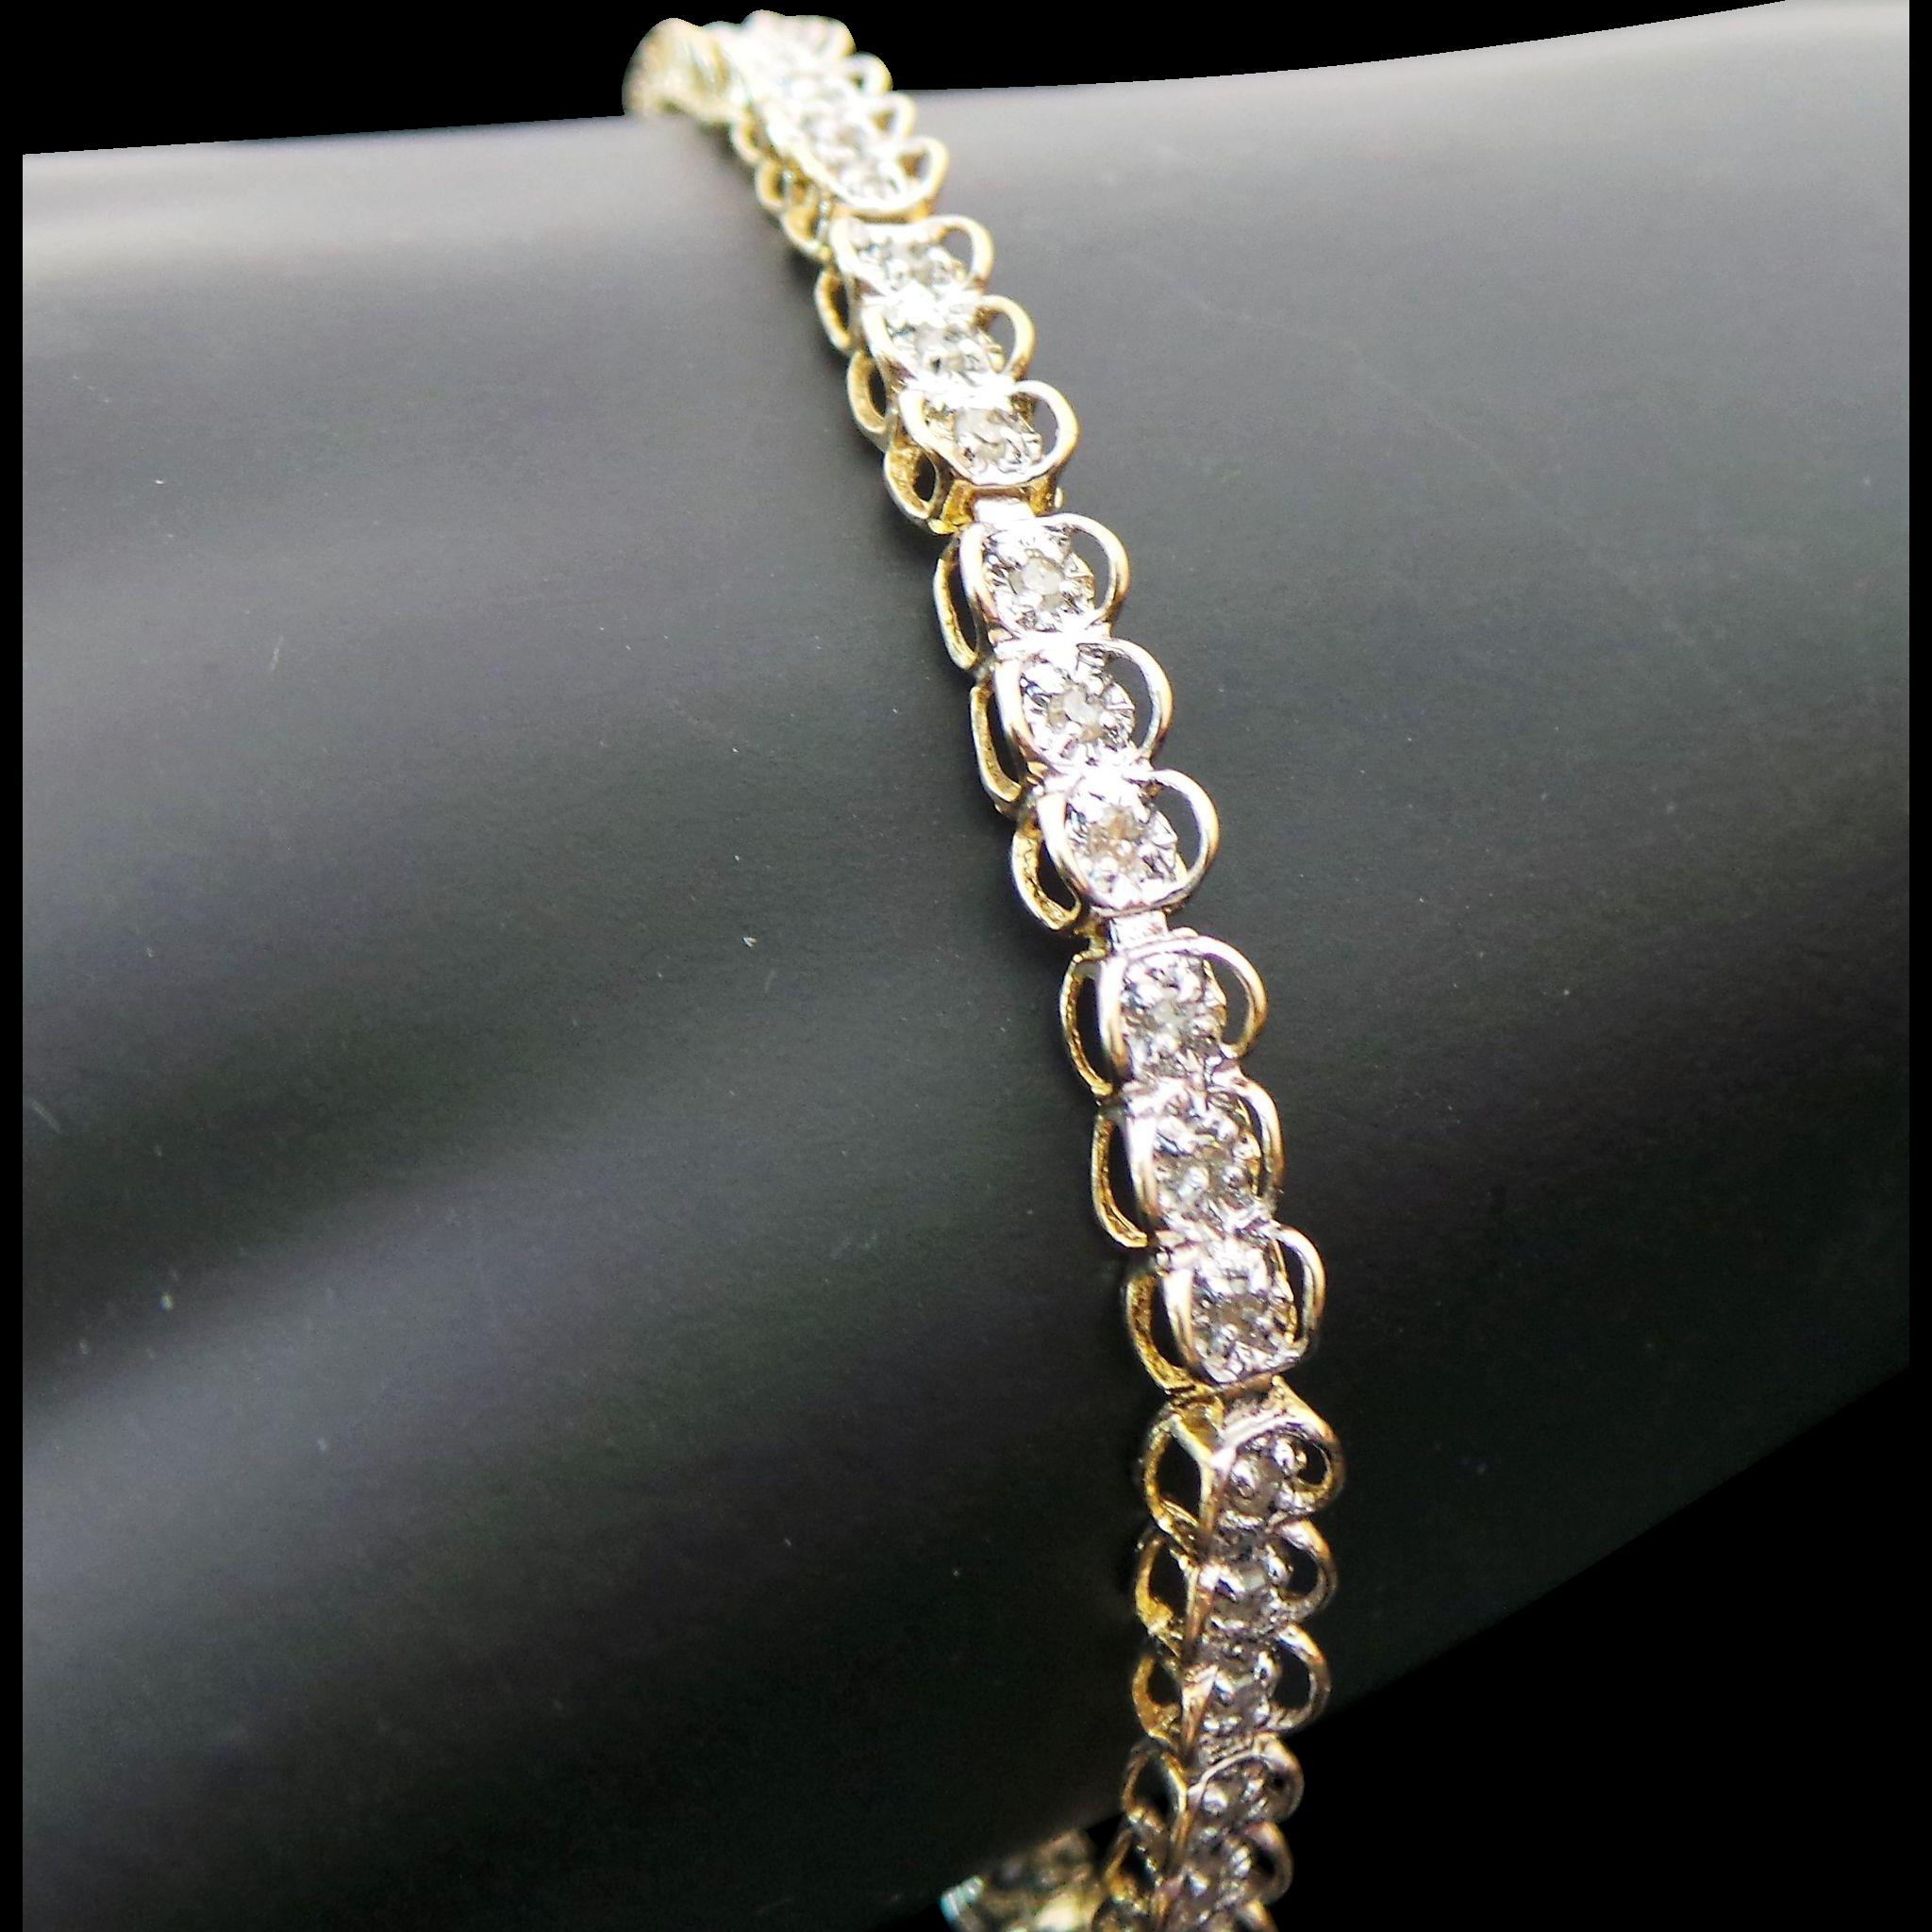 10k Yellow Gold 50 Carat Diamond Tennis Bracelet From